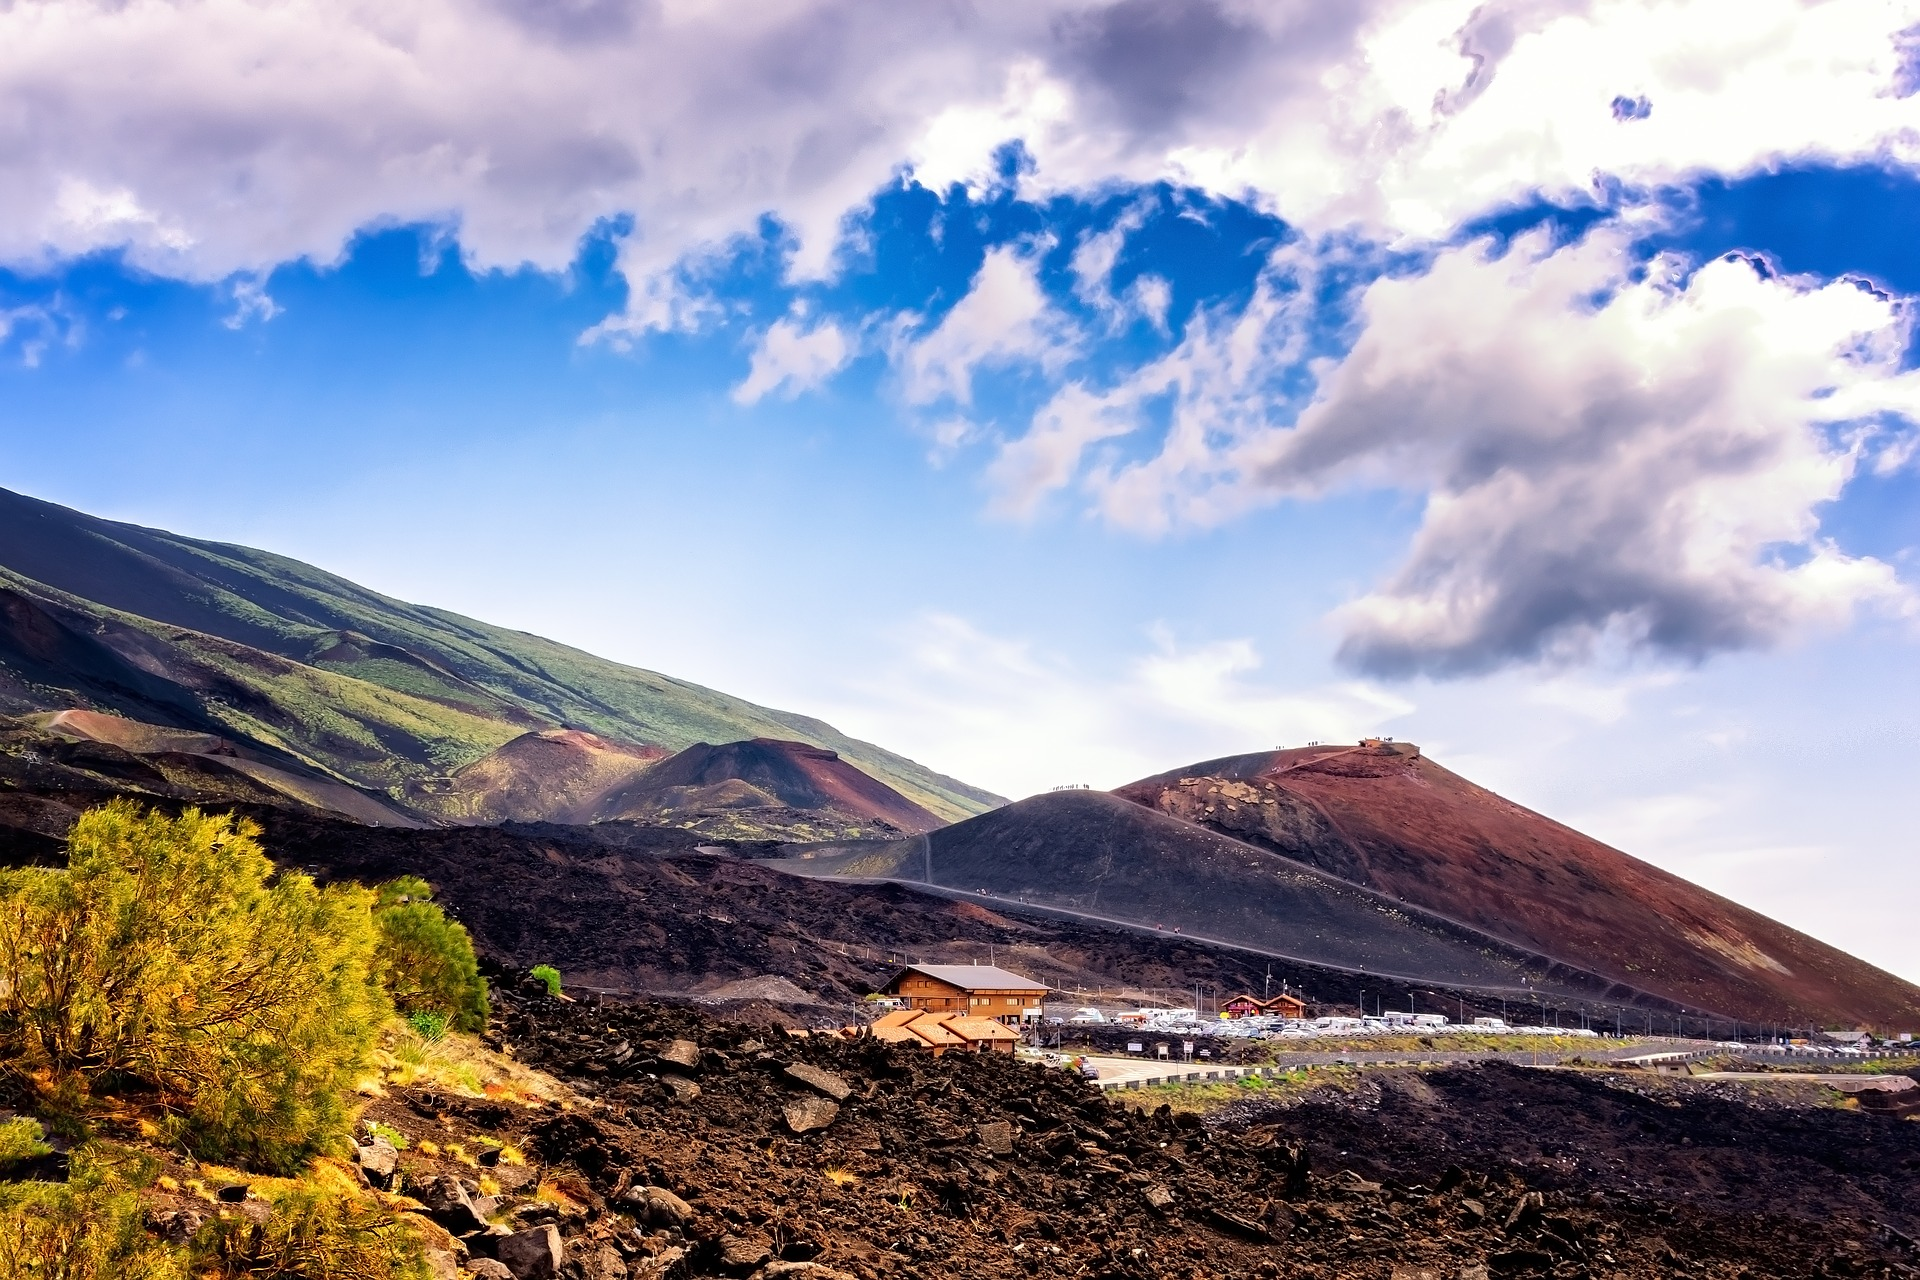 Mount Etna souvenir shops. Photo via Pixabay.